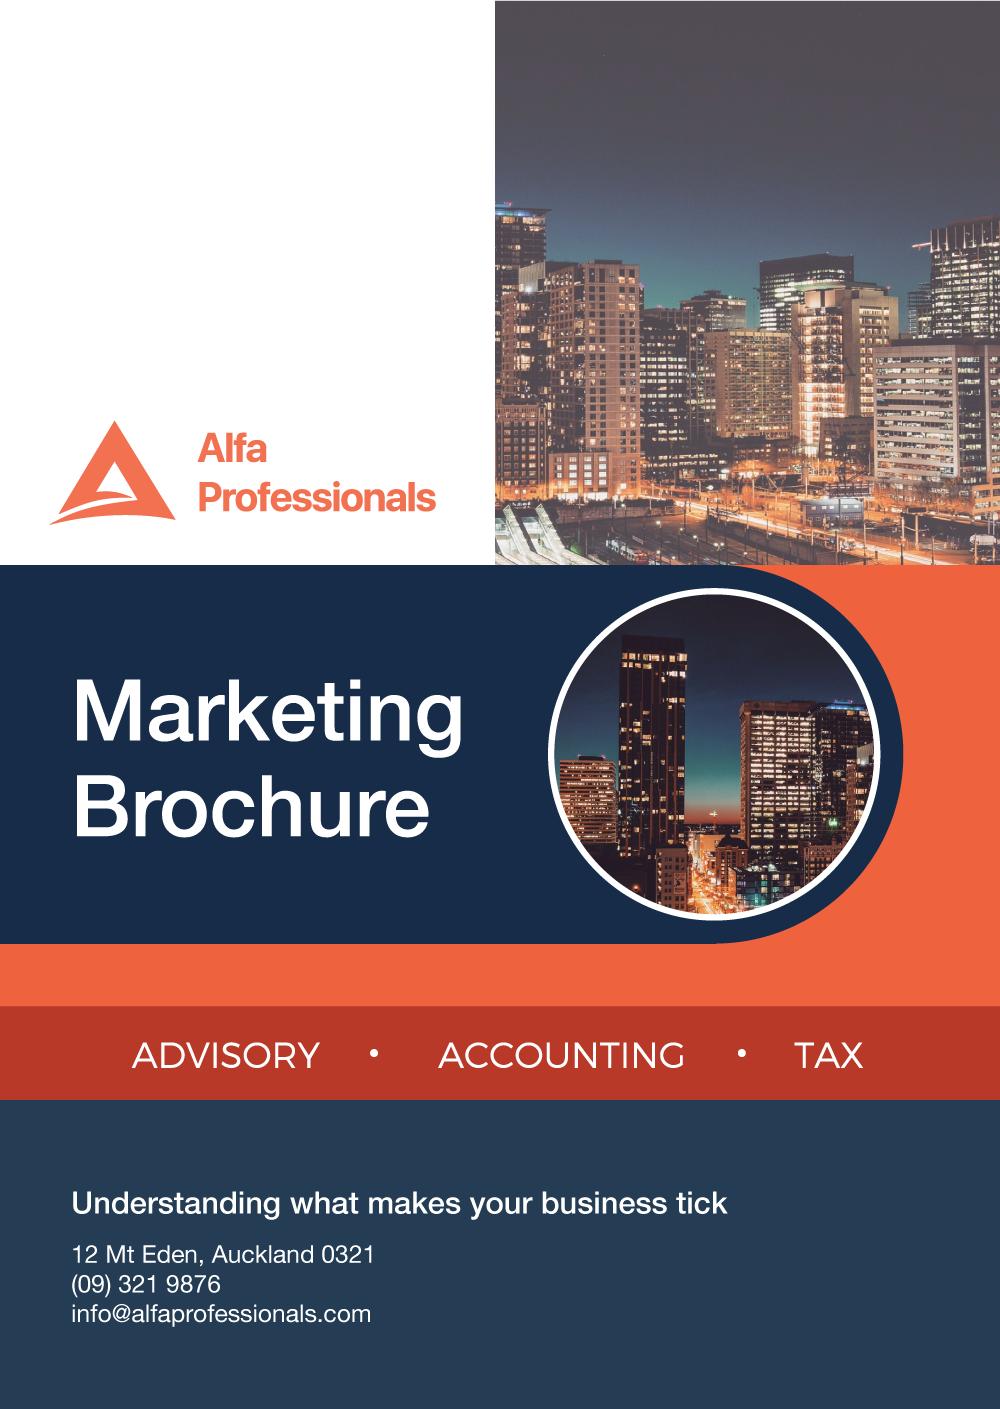 Marketing Brochure Cover